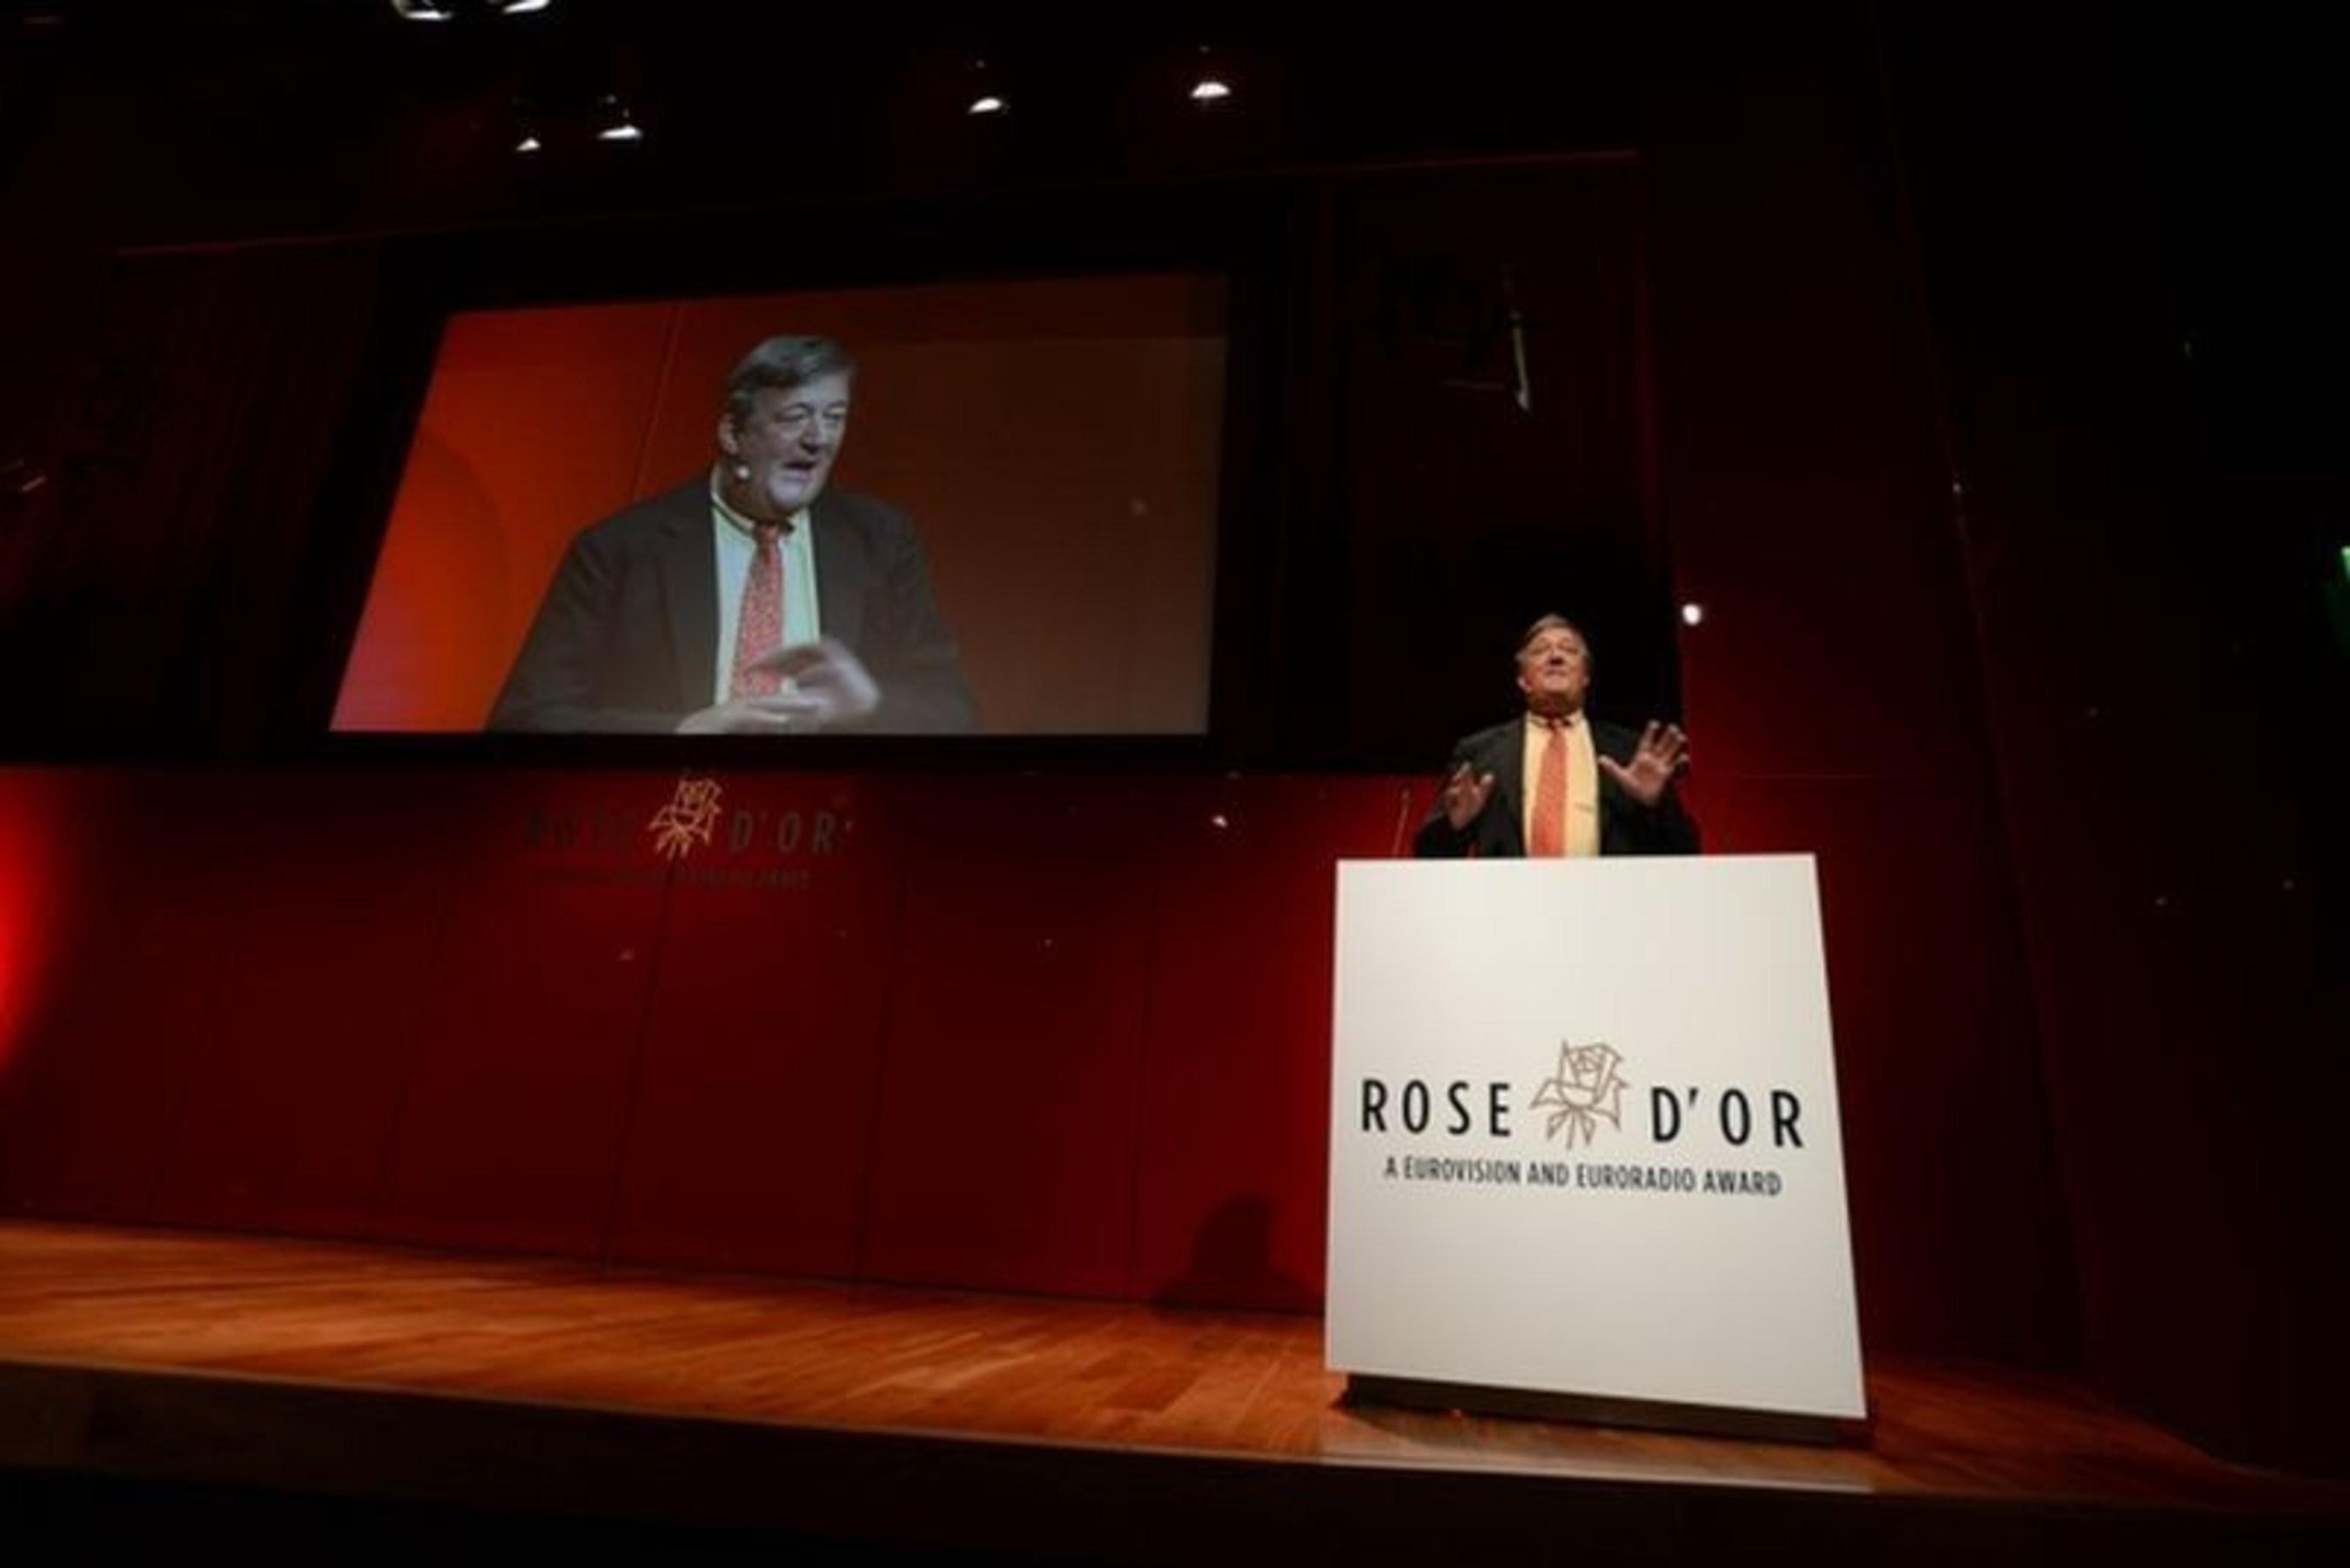 Stephen Fry wins Rose d'Or Lifetime Achievement Award (PRNewsFoto/European Broadcasting Union) (PRNewsFoto/European Broadcasting Union)